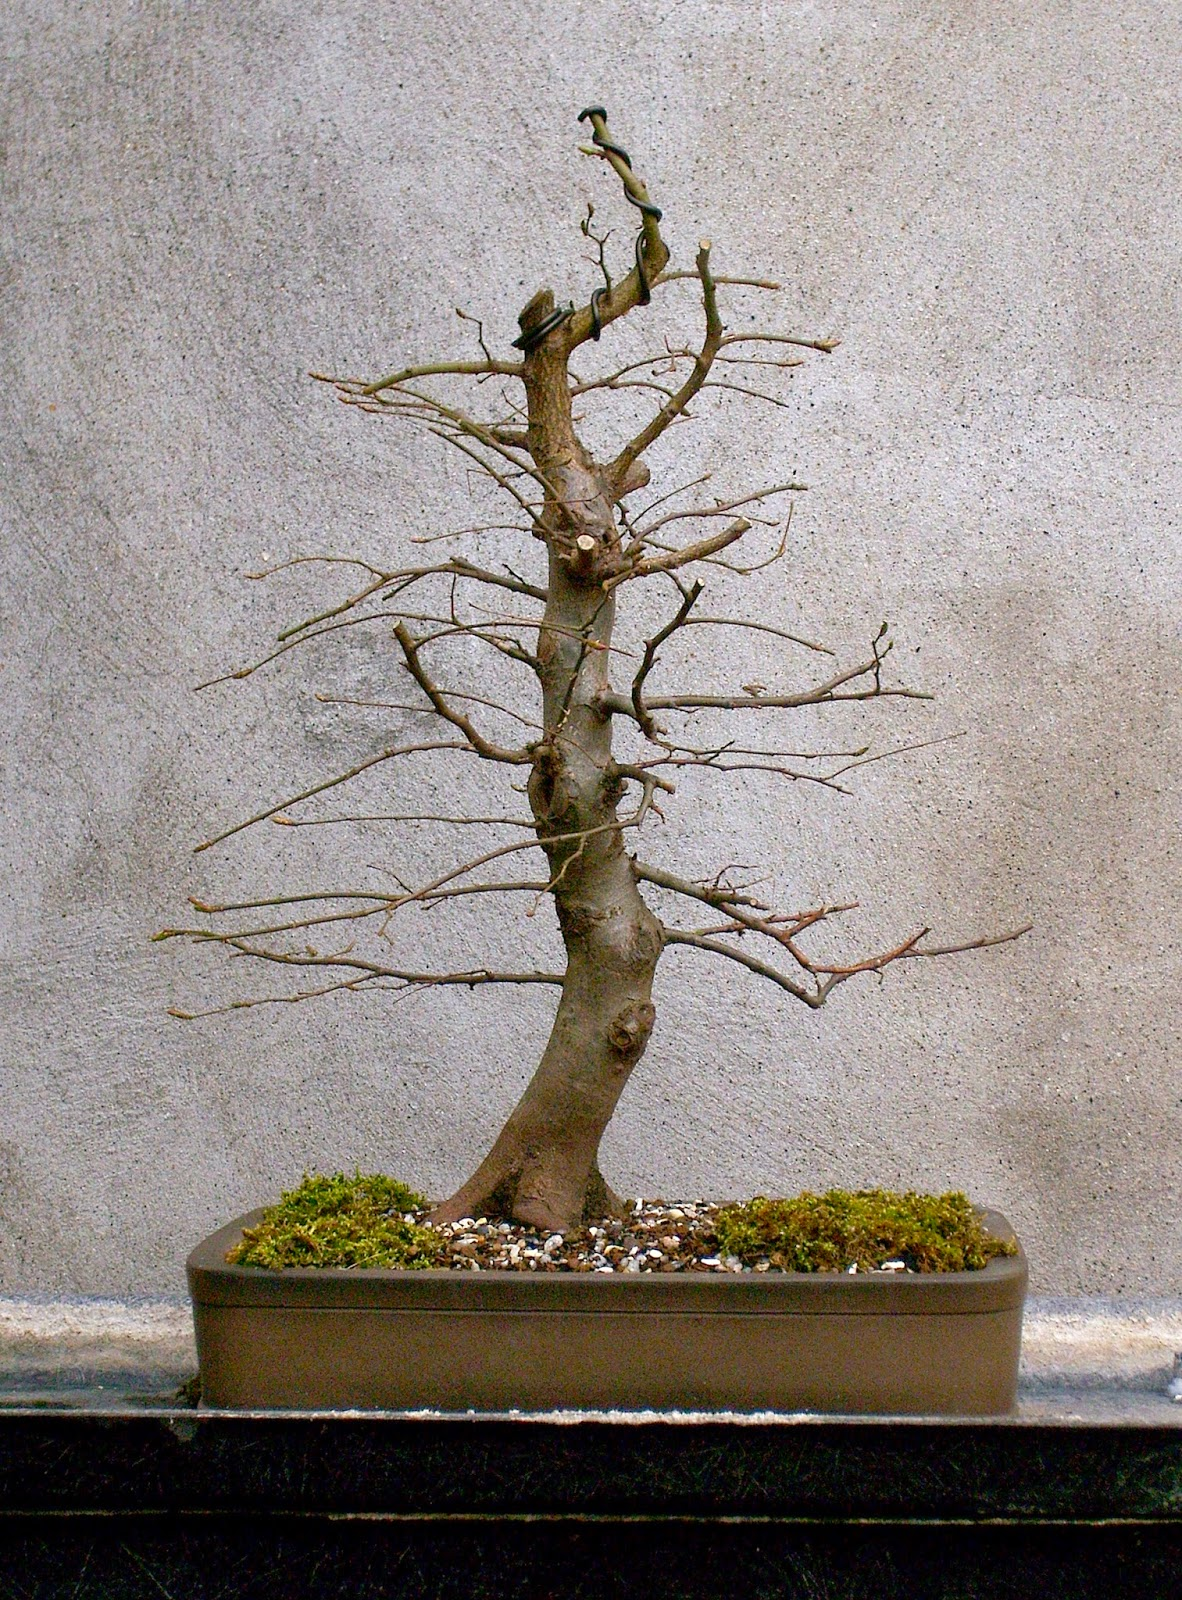 Silva Naturalis Hornbeam Bonsai 6 Years Of Development